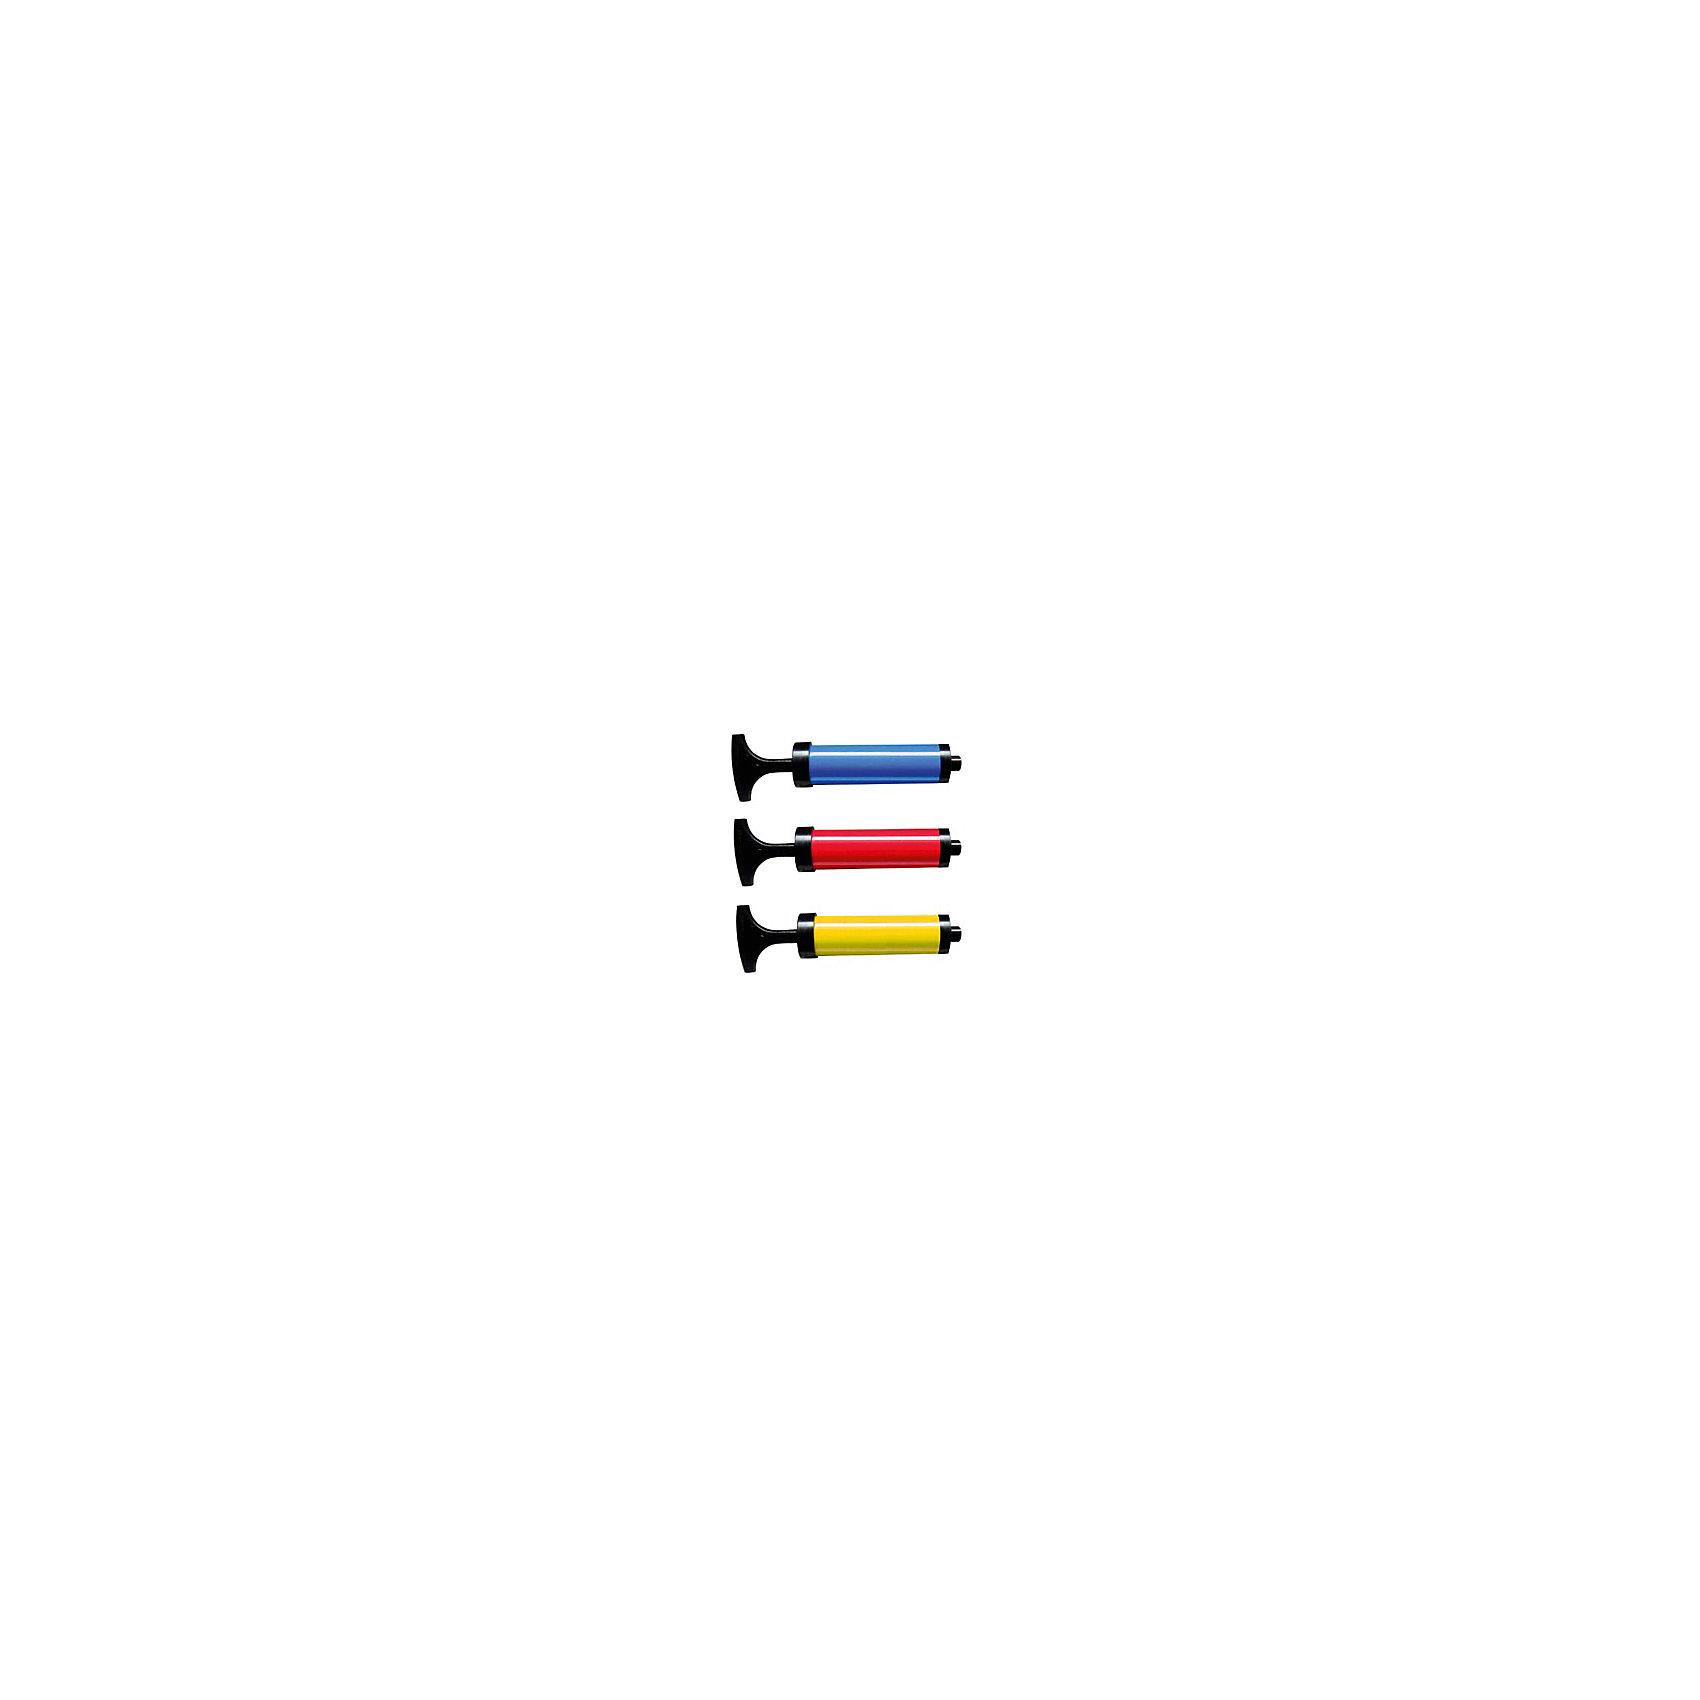 InSummer Насос, 8 дюймов , InSummer insummer конус красный insummer